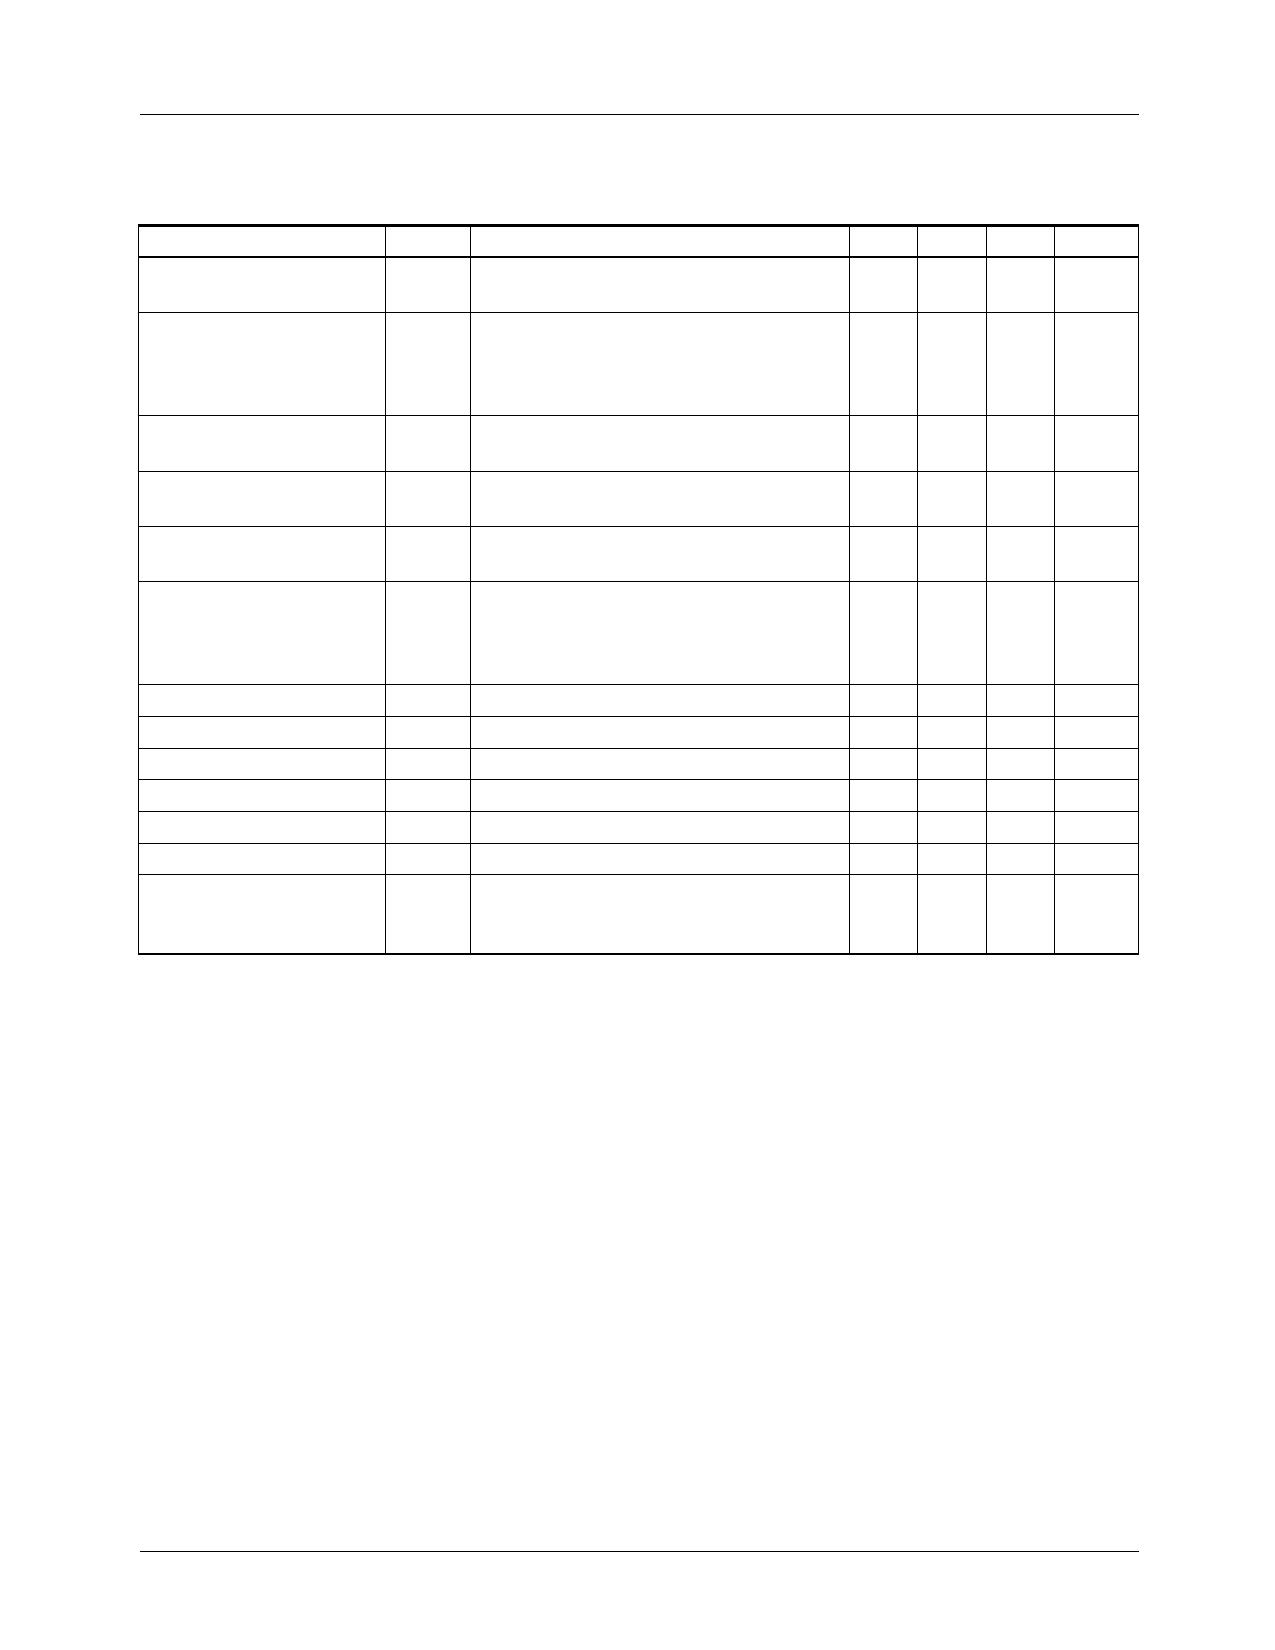 KA78T15 pdf, ピン配列